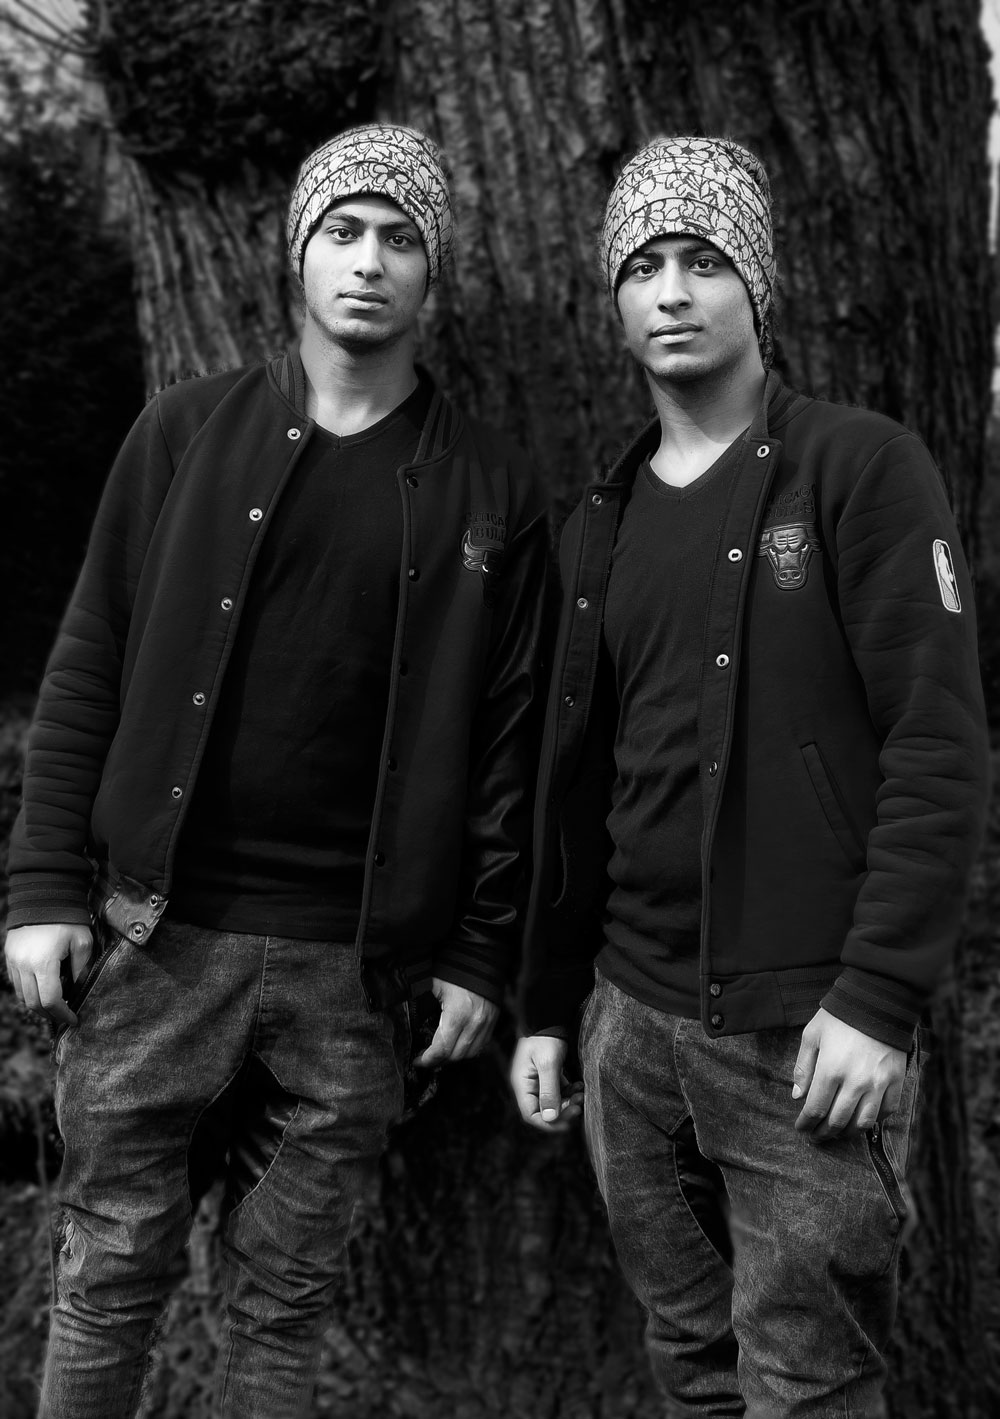 Amjad-and-Adham-Saleh